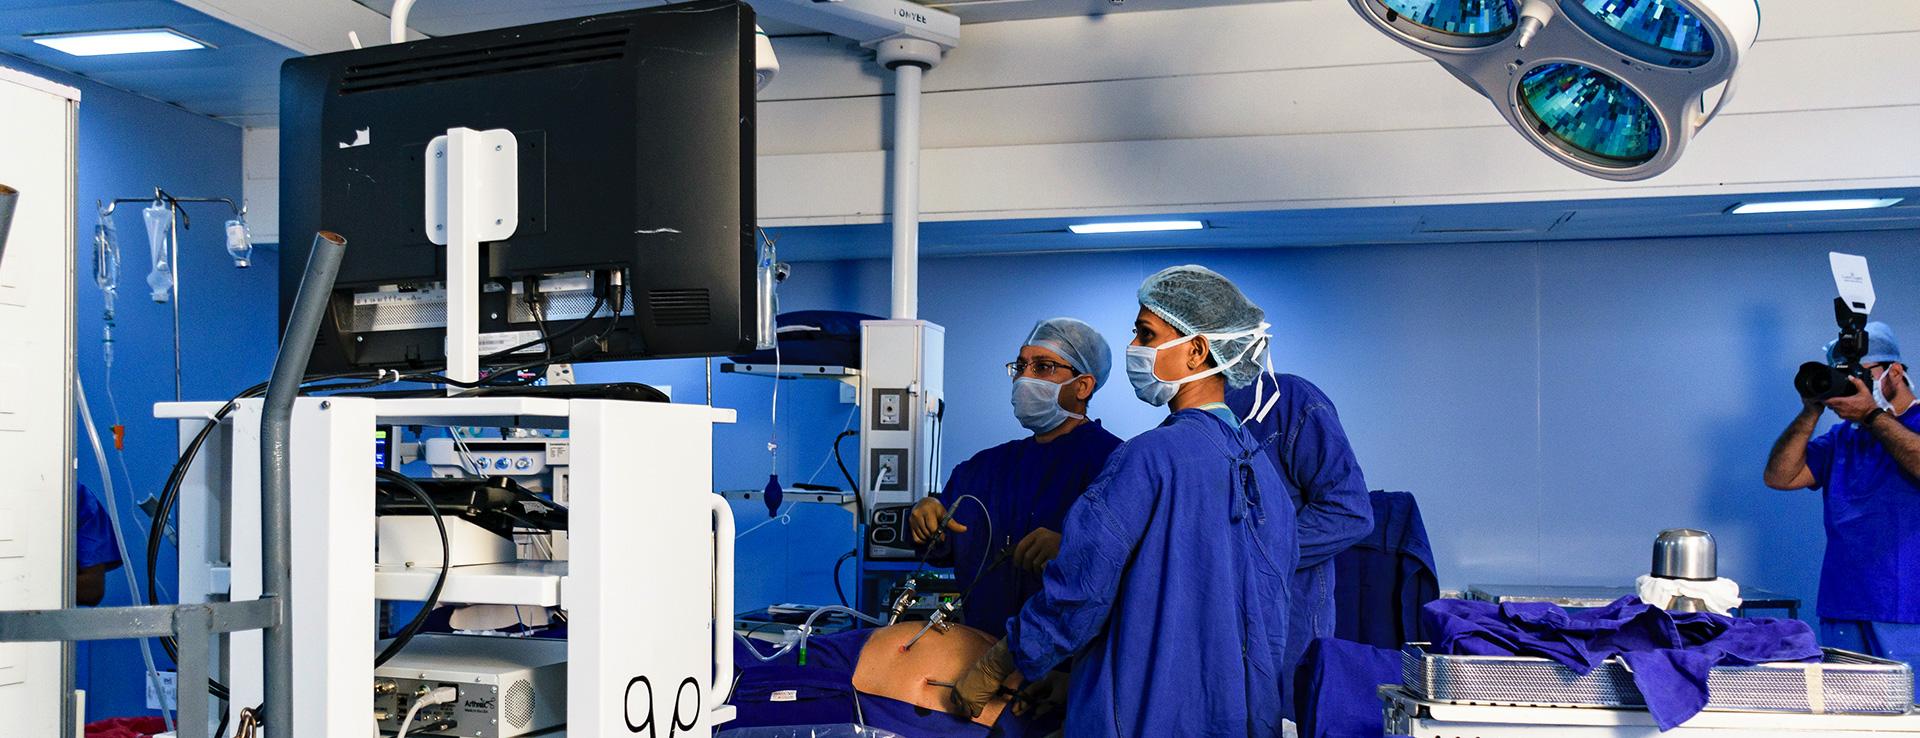 bariatric-surgery-services-in-mumbai